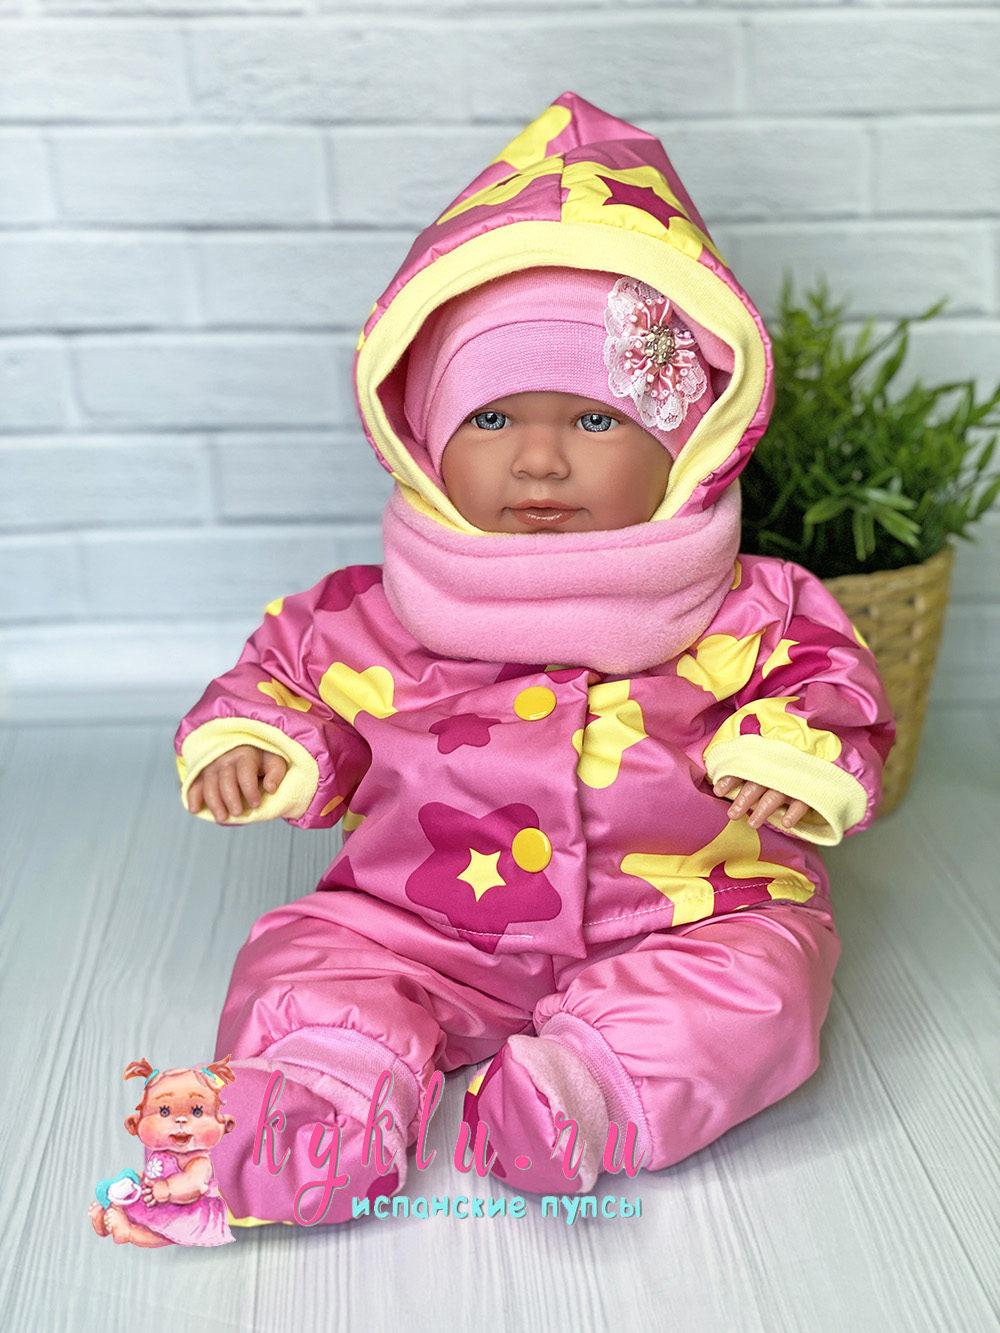 Теплый костюм для куклы розовый